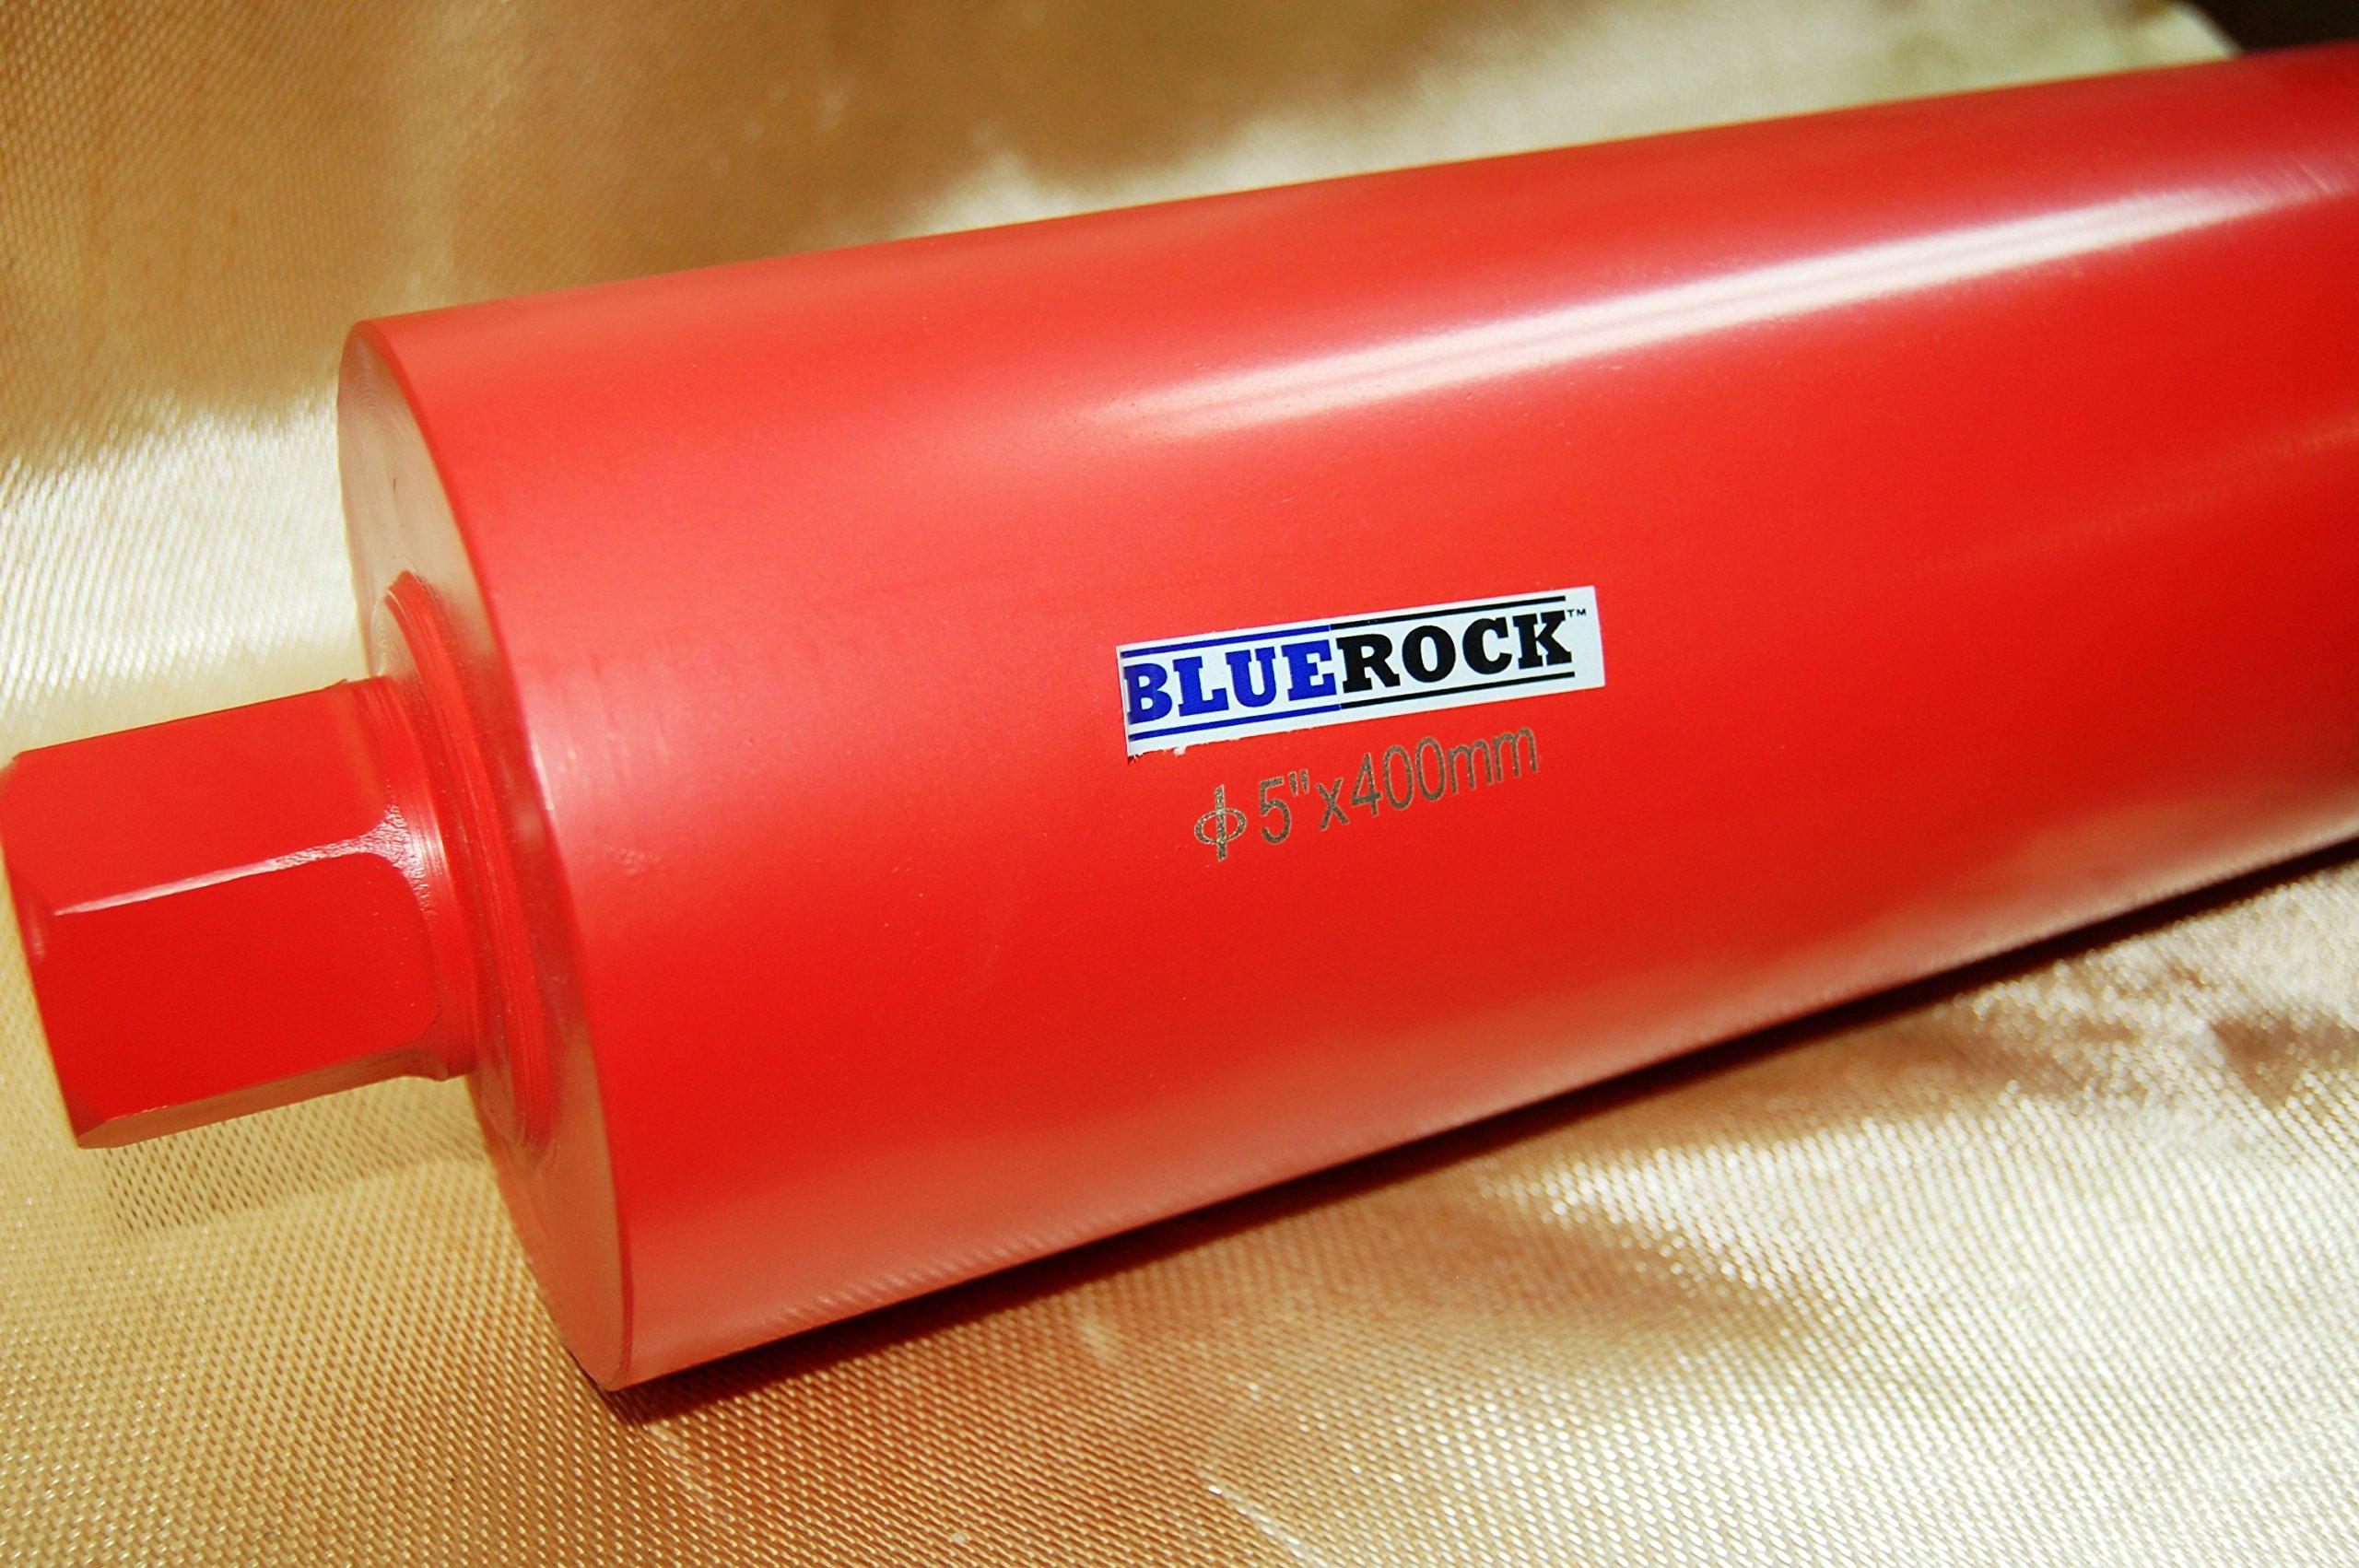 5'' Diamond WET Coring Bit For Concrete Core Drill by BLUEROCK Tools by BLUEROCK